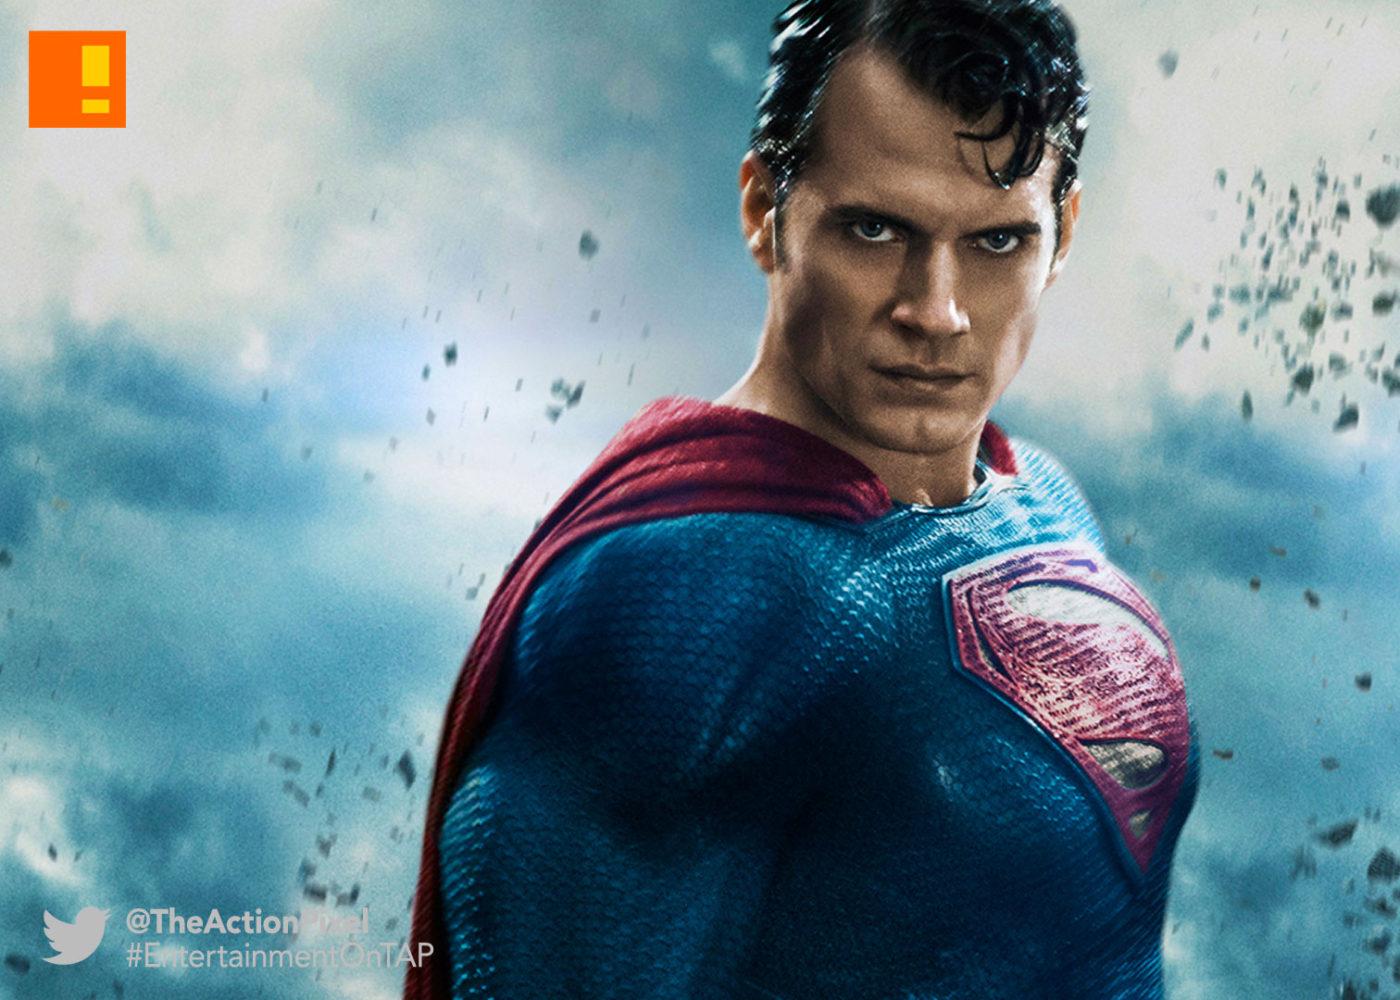 superman, dc comics, batman v superman, dawn of justice, dc comics, @theactionpixel, the action pixel, entertainment on tap, henry cavill, zack snyder